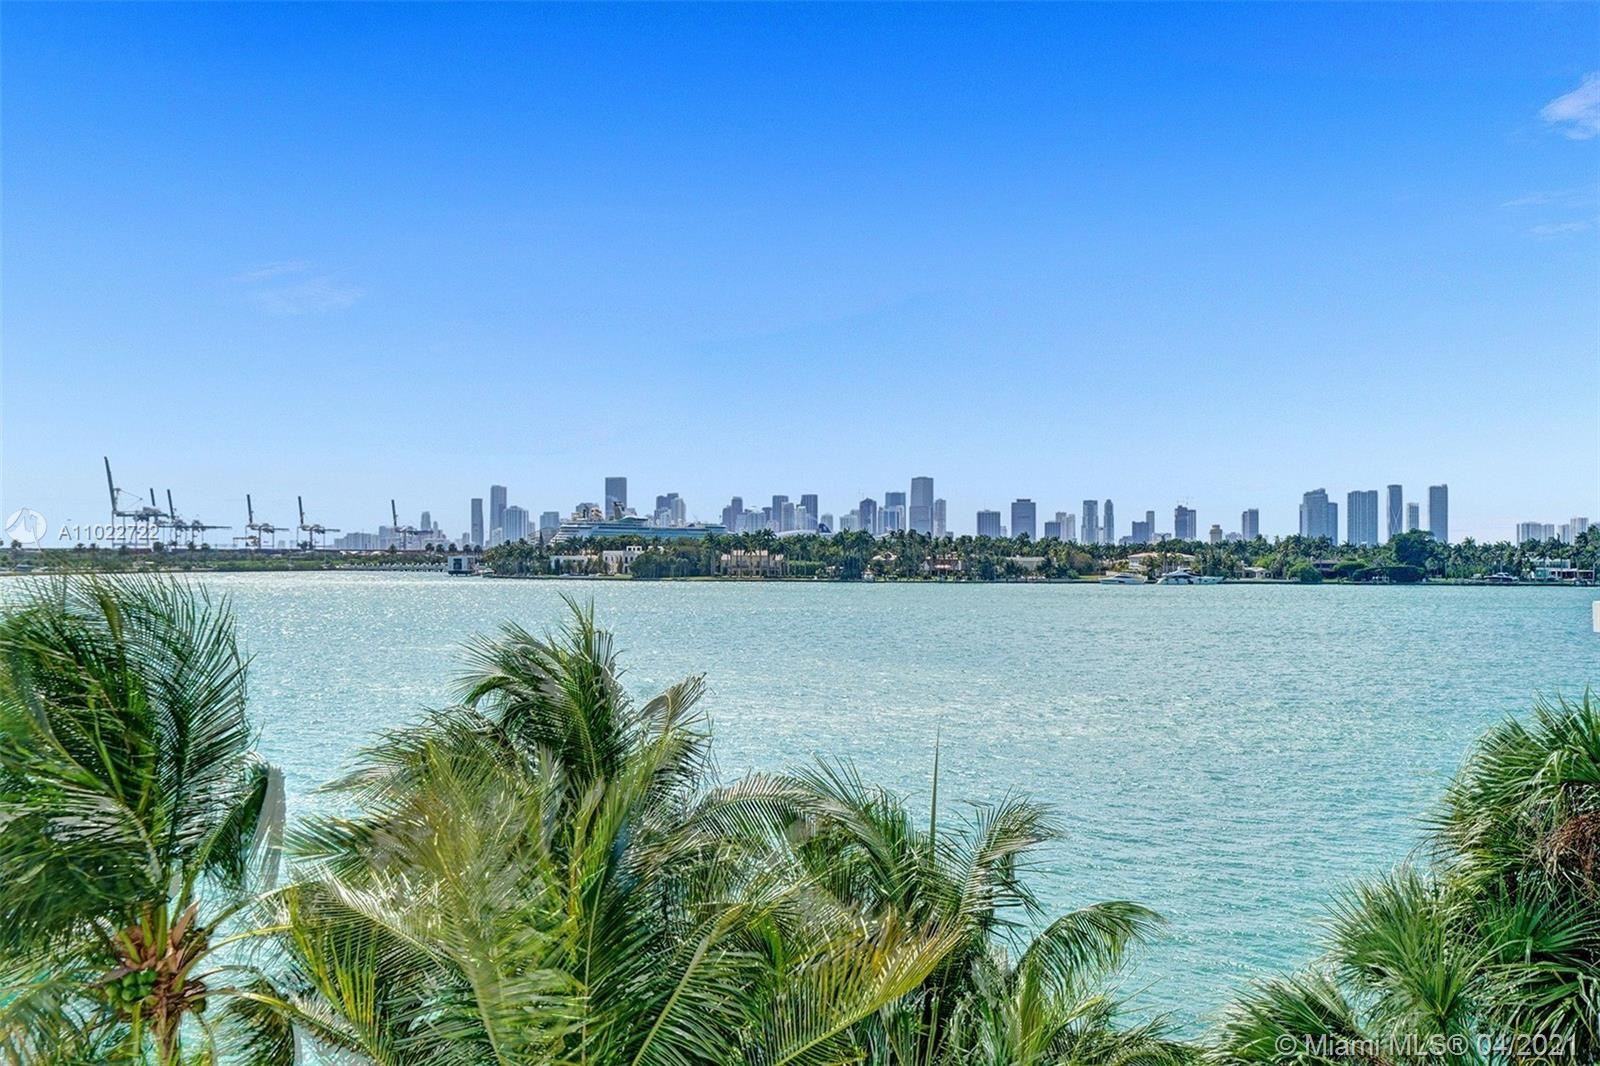 650 West Ave #408, Miami Beach, FL 33139 - #: A11022722